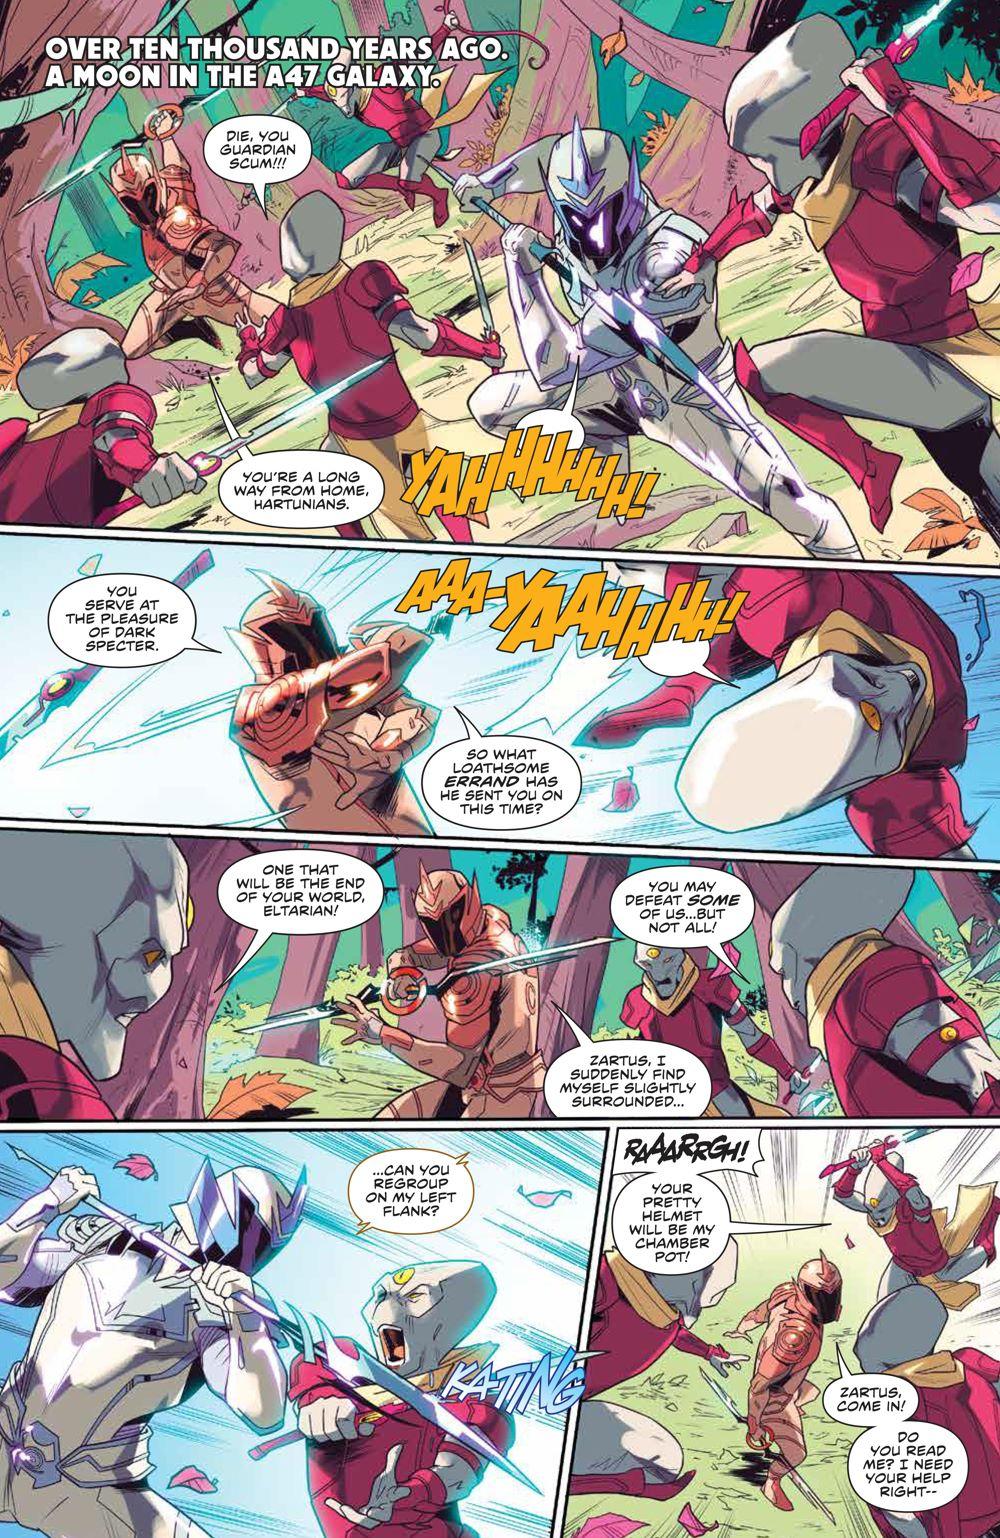 MightyMorphin_006_PRESS_3 ComicList Previews: MIGHTY MORPHIN #6